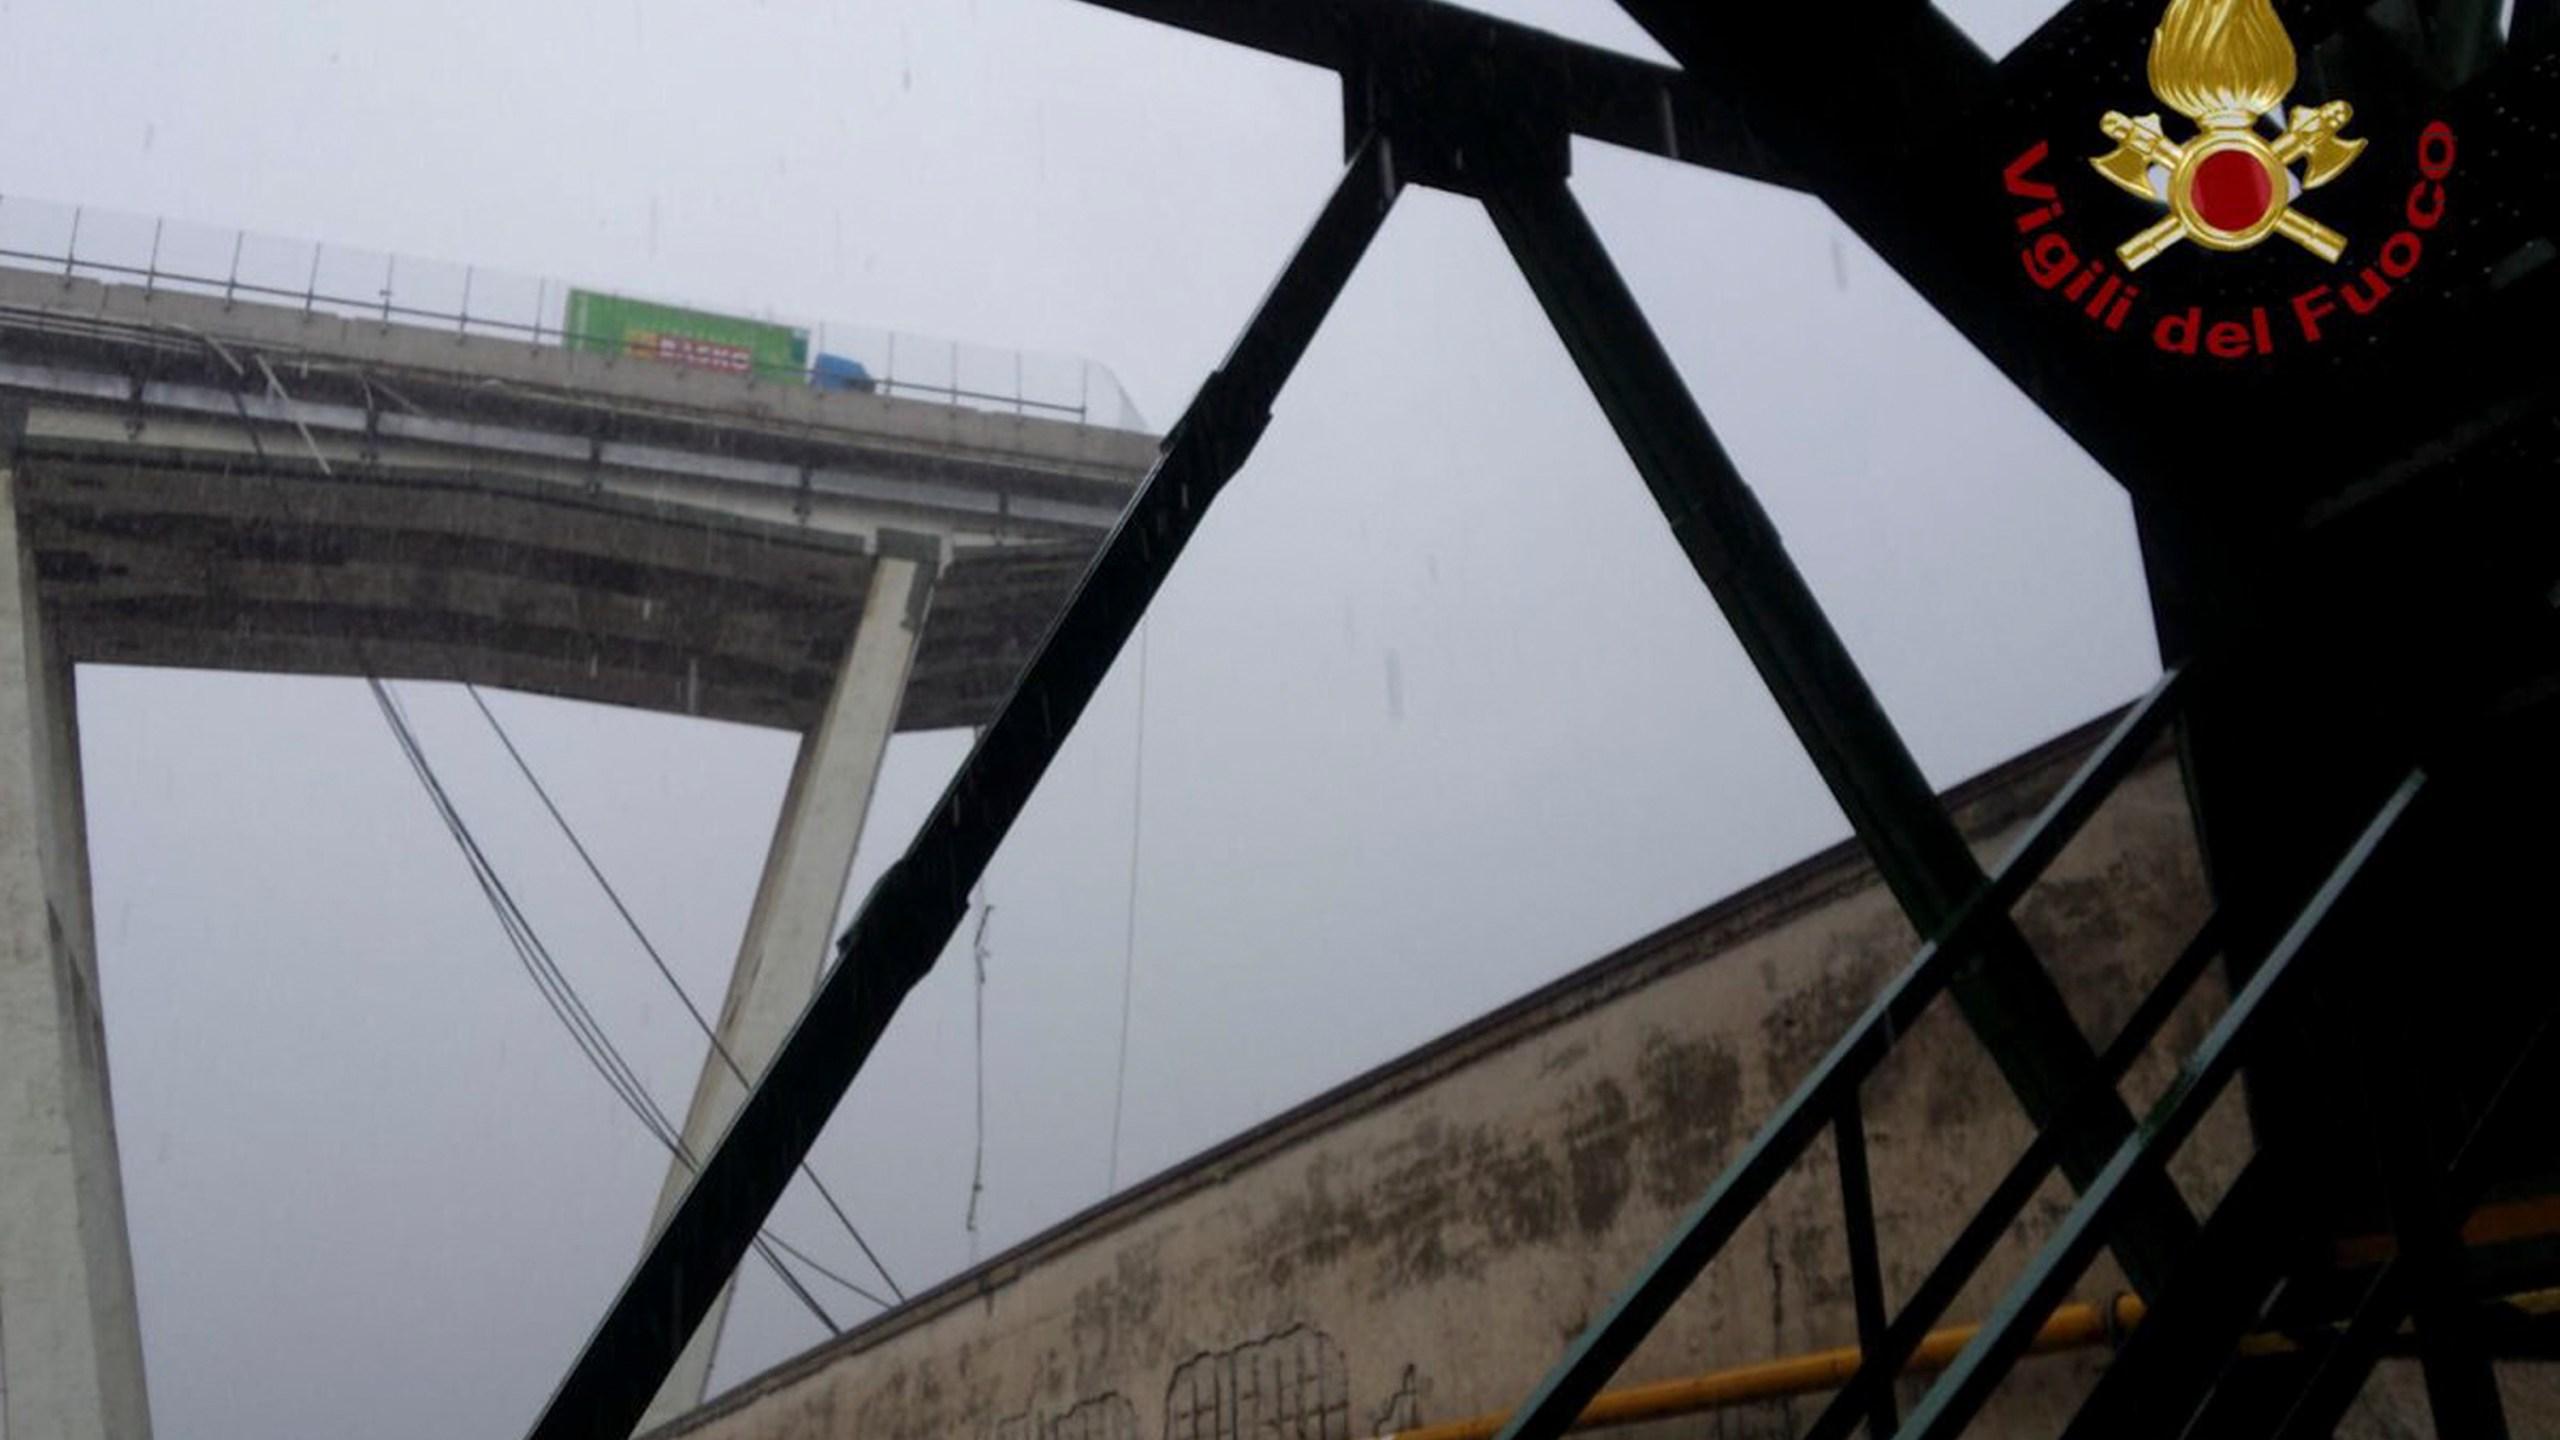 Italy_Highway_Collapse_87808-159532.jpg65275120